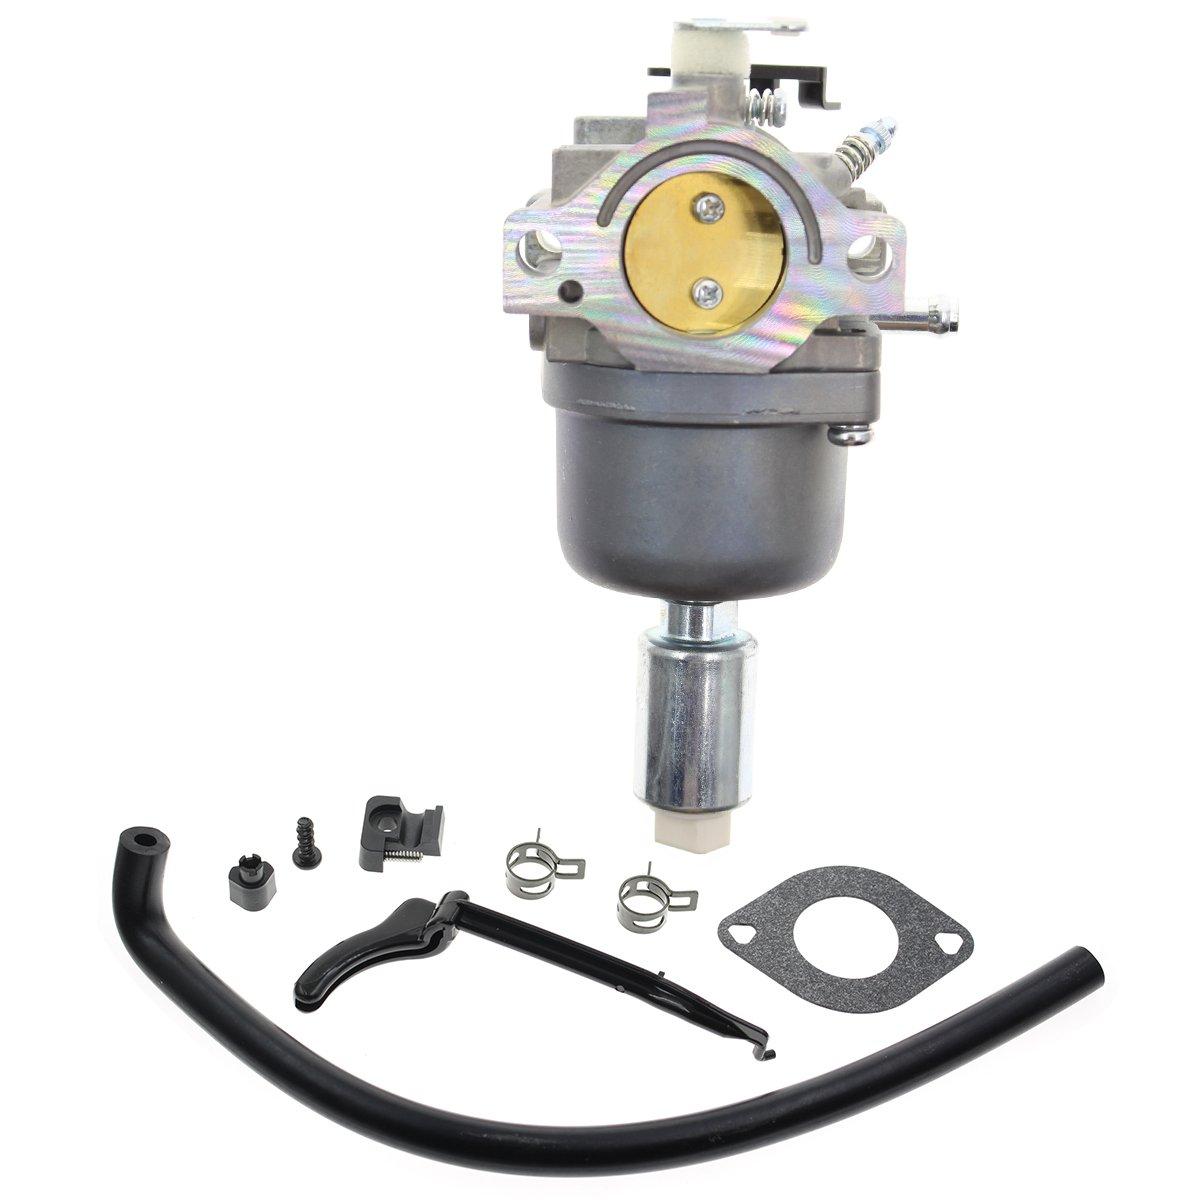 AUTOKAY New Carburetor 791858 792358 793224 794572 Intek 14hp 18hp For Briggs & Stratton